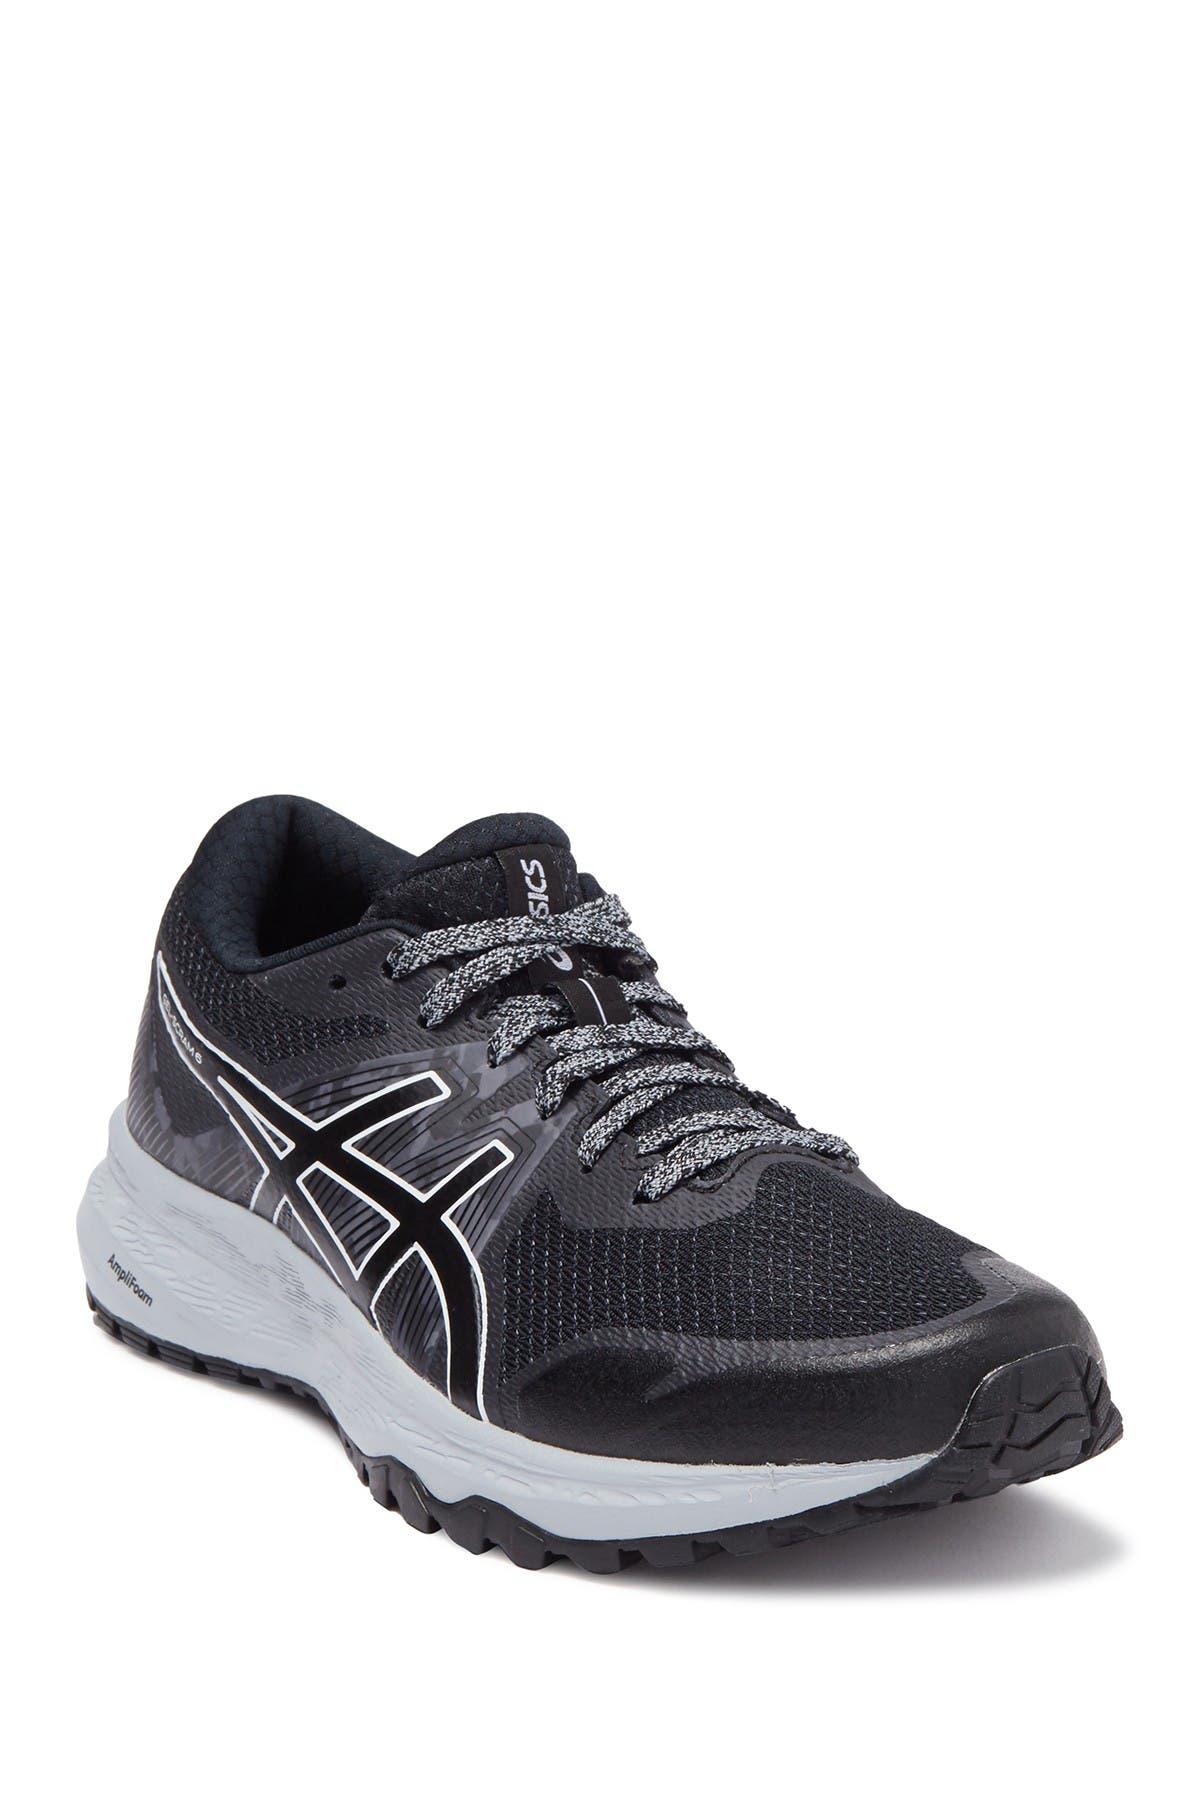 Image of ASICS GEL-Scram 6 Sneaker